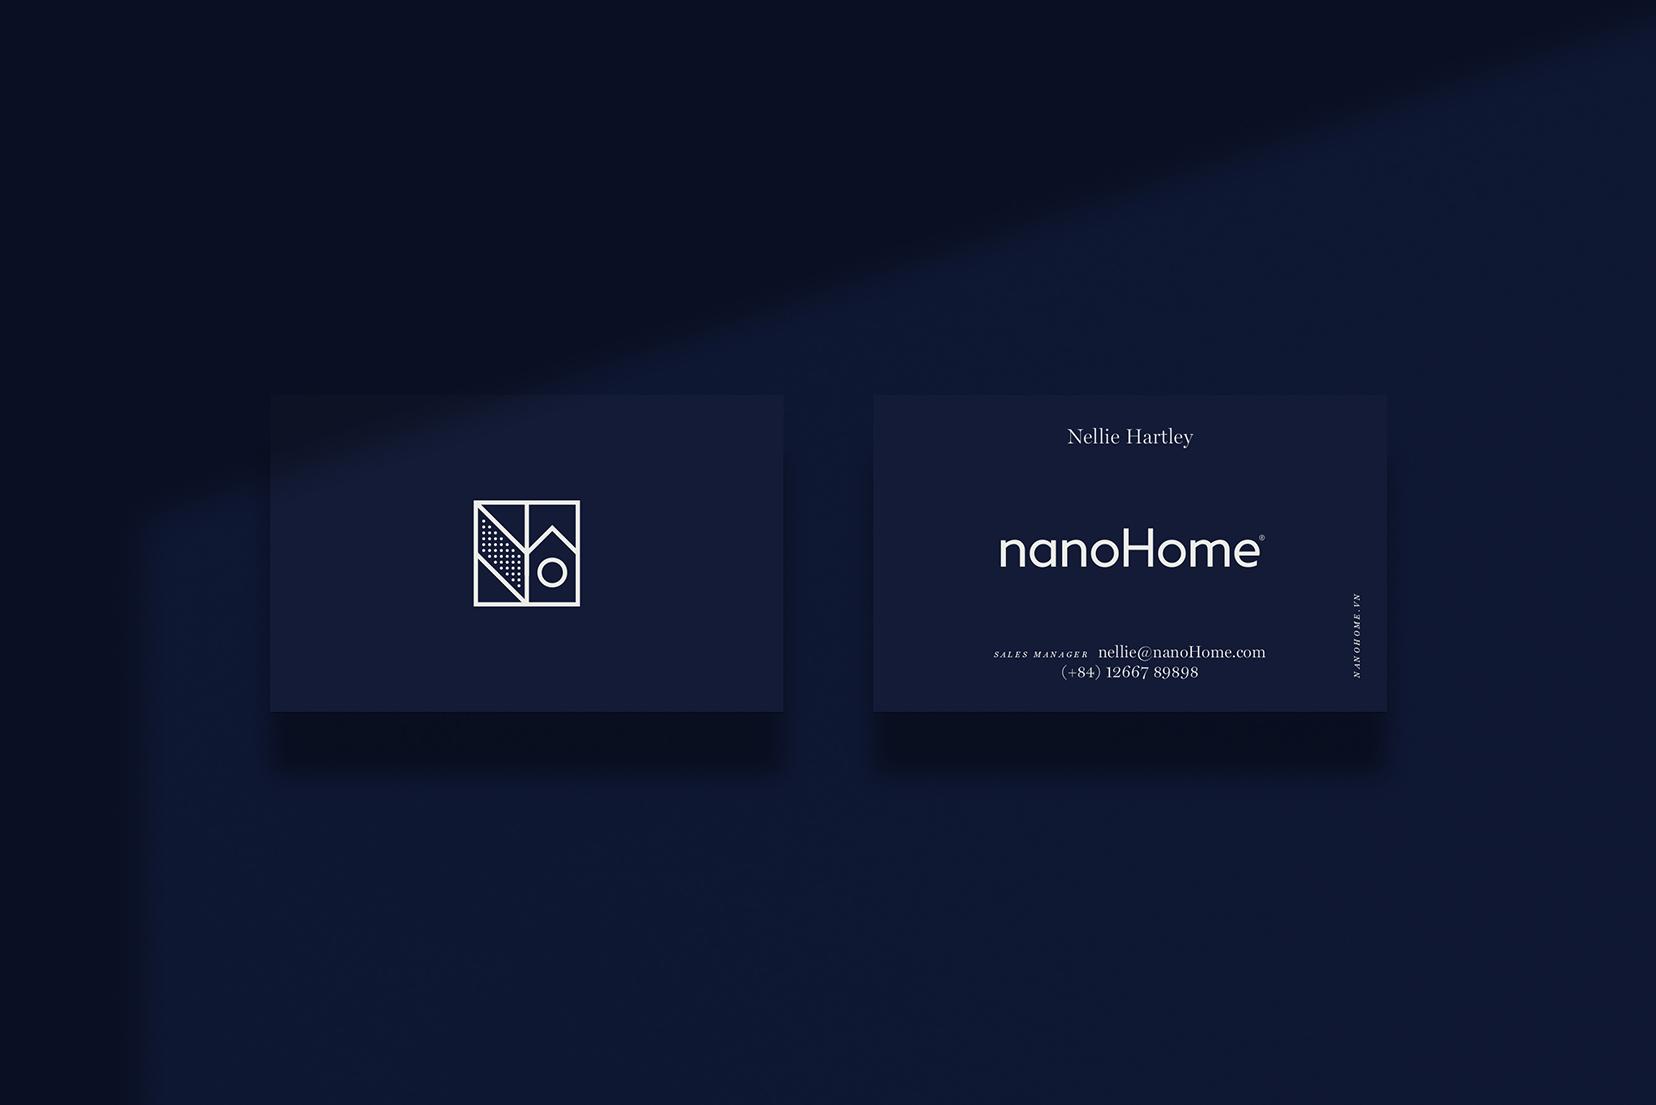 nanoHome business card